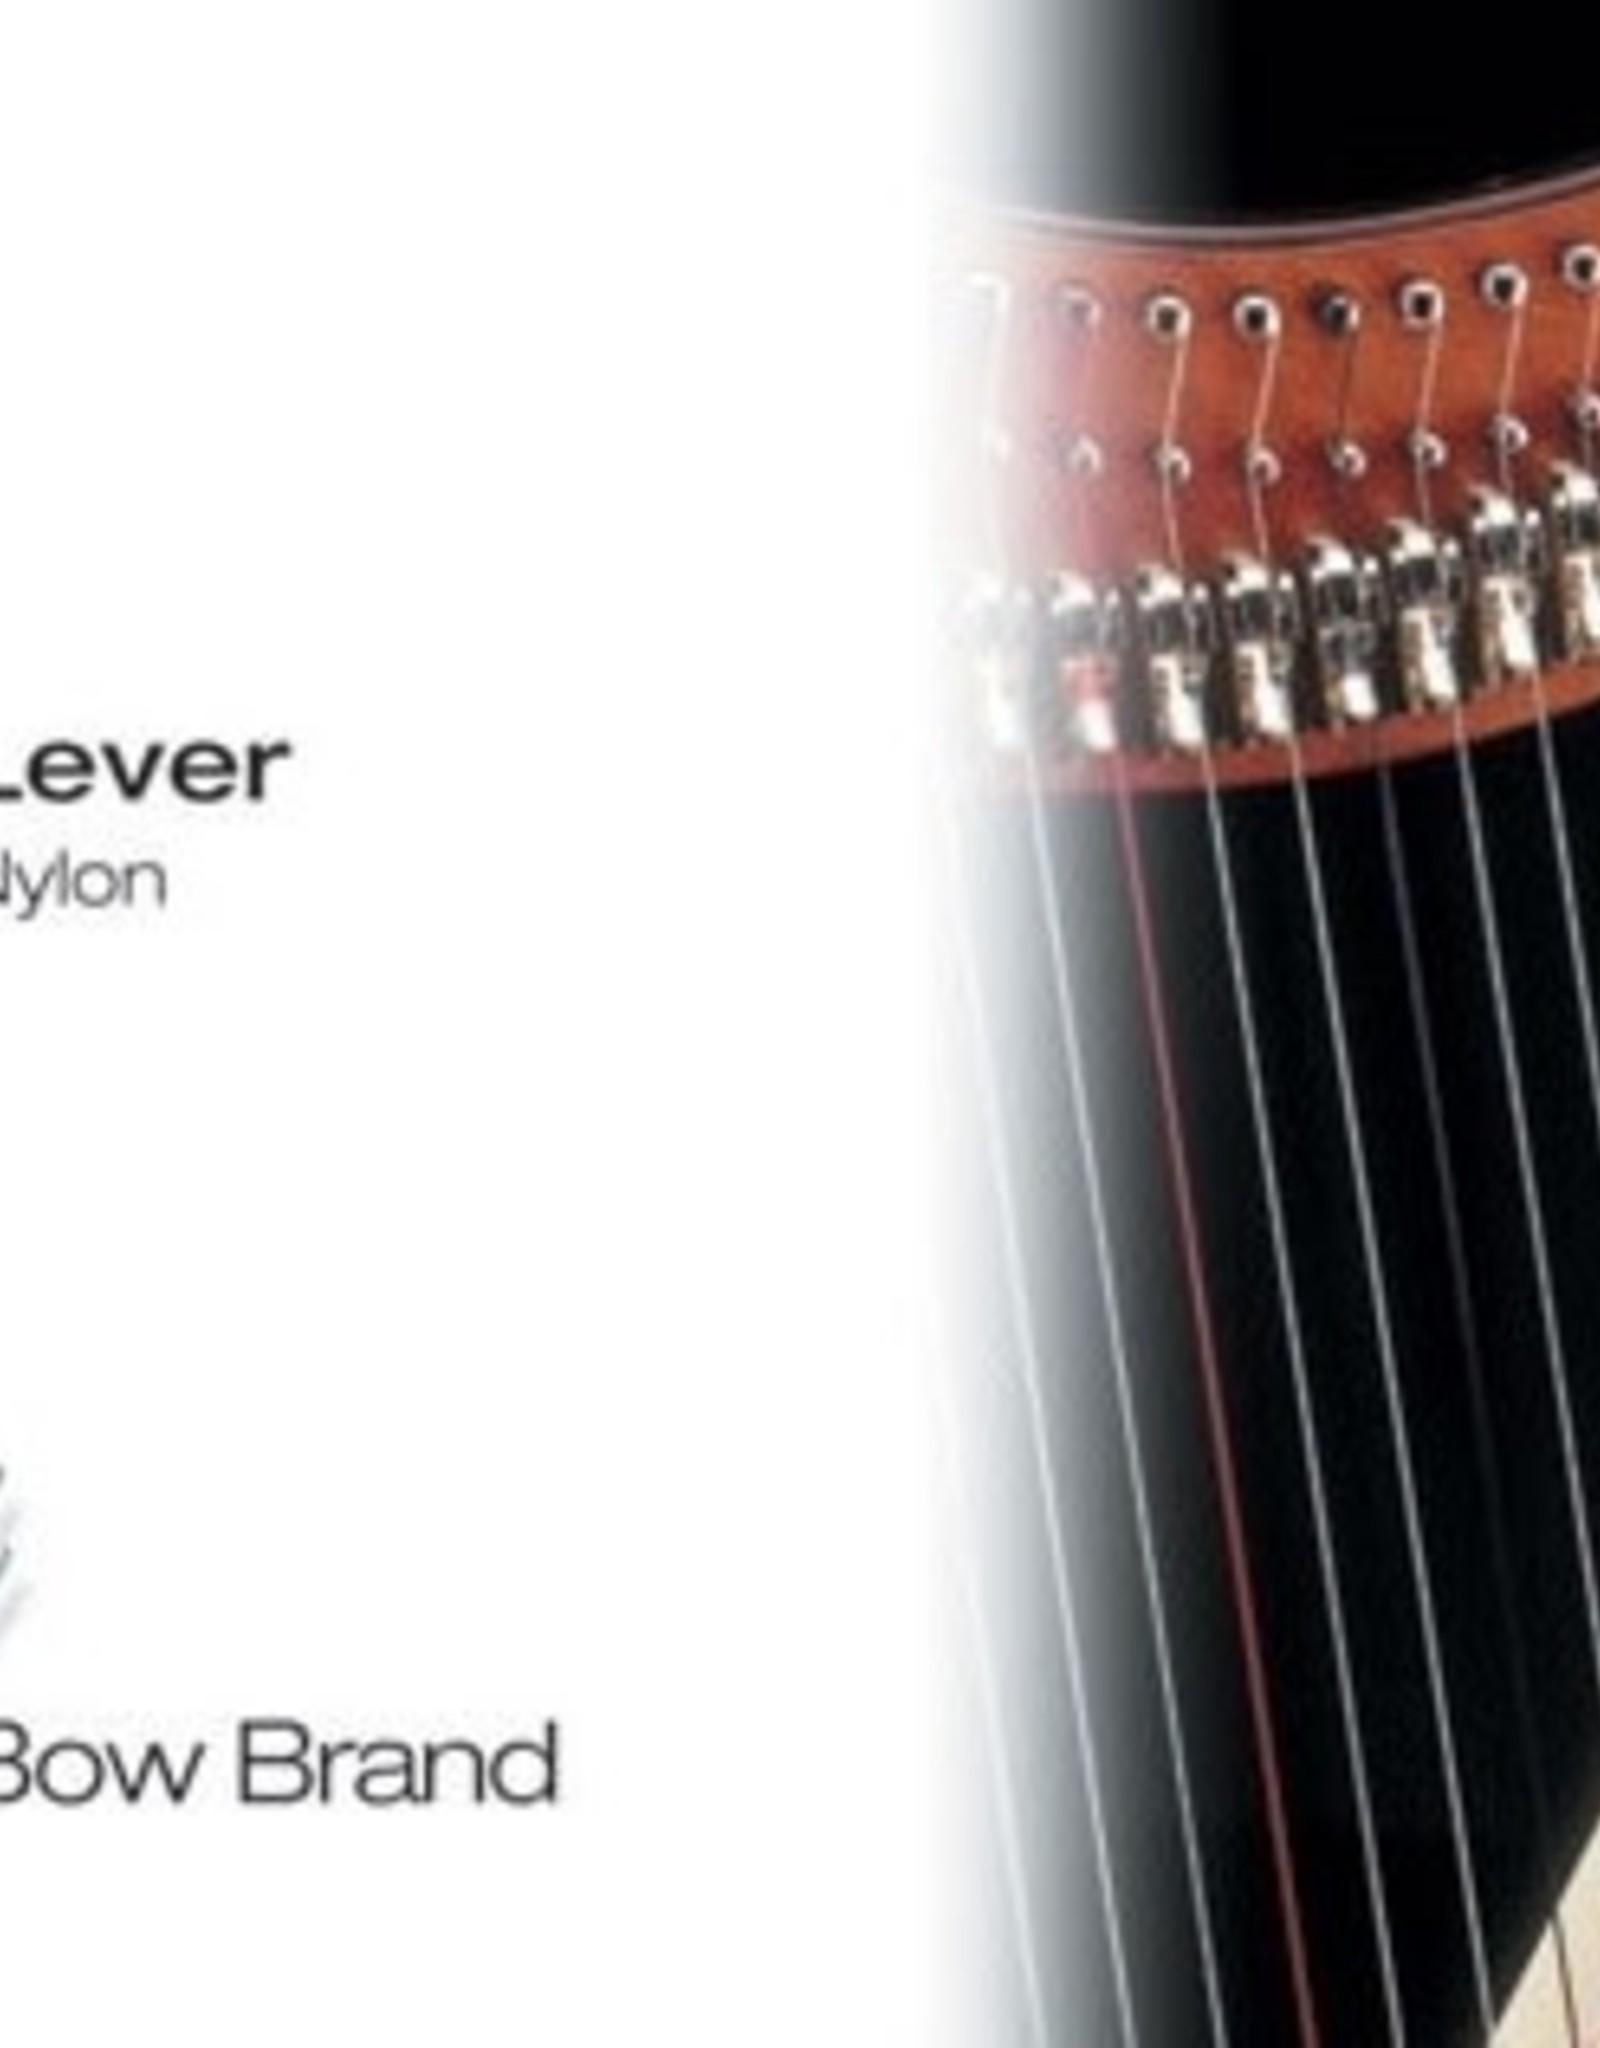 BOW BRAND  klep nylon - lever NYLON 16/3 re